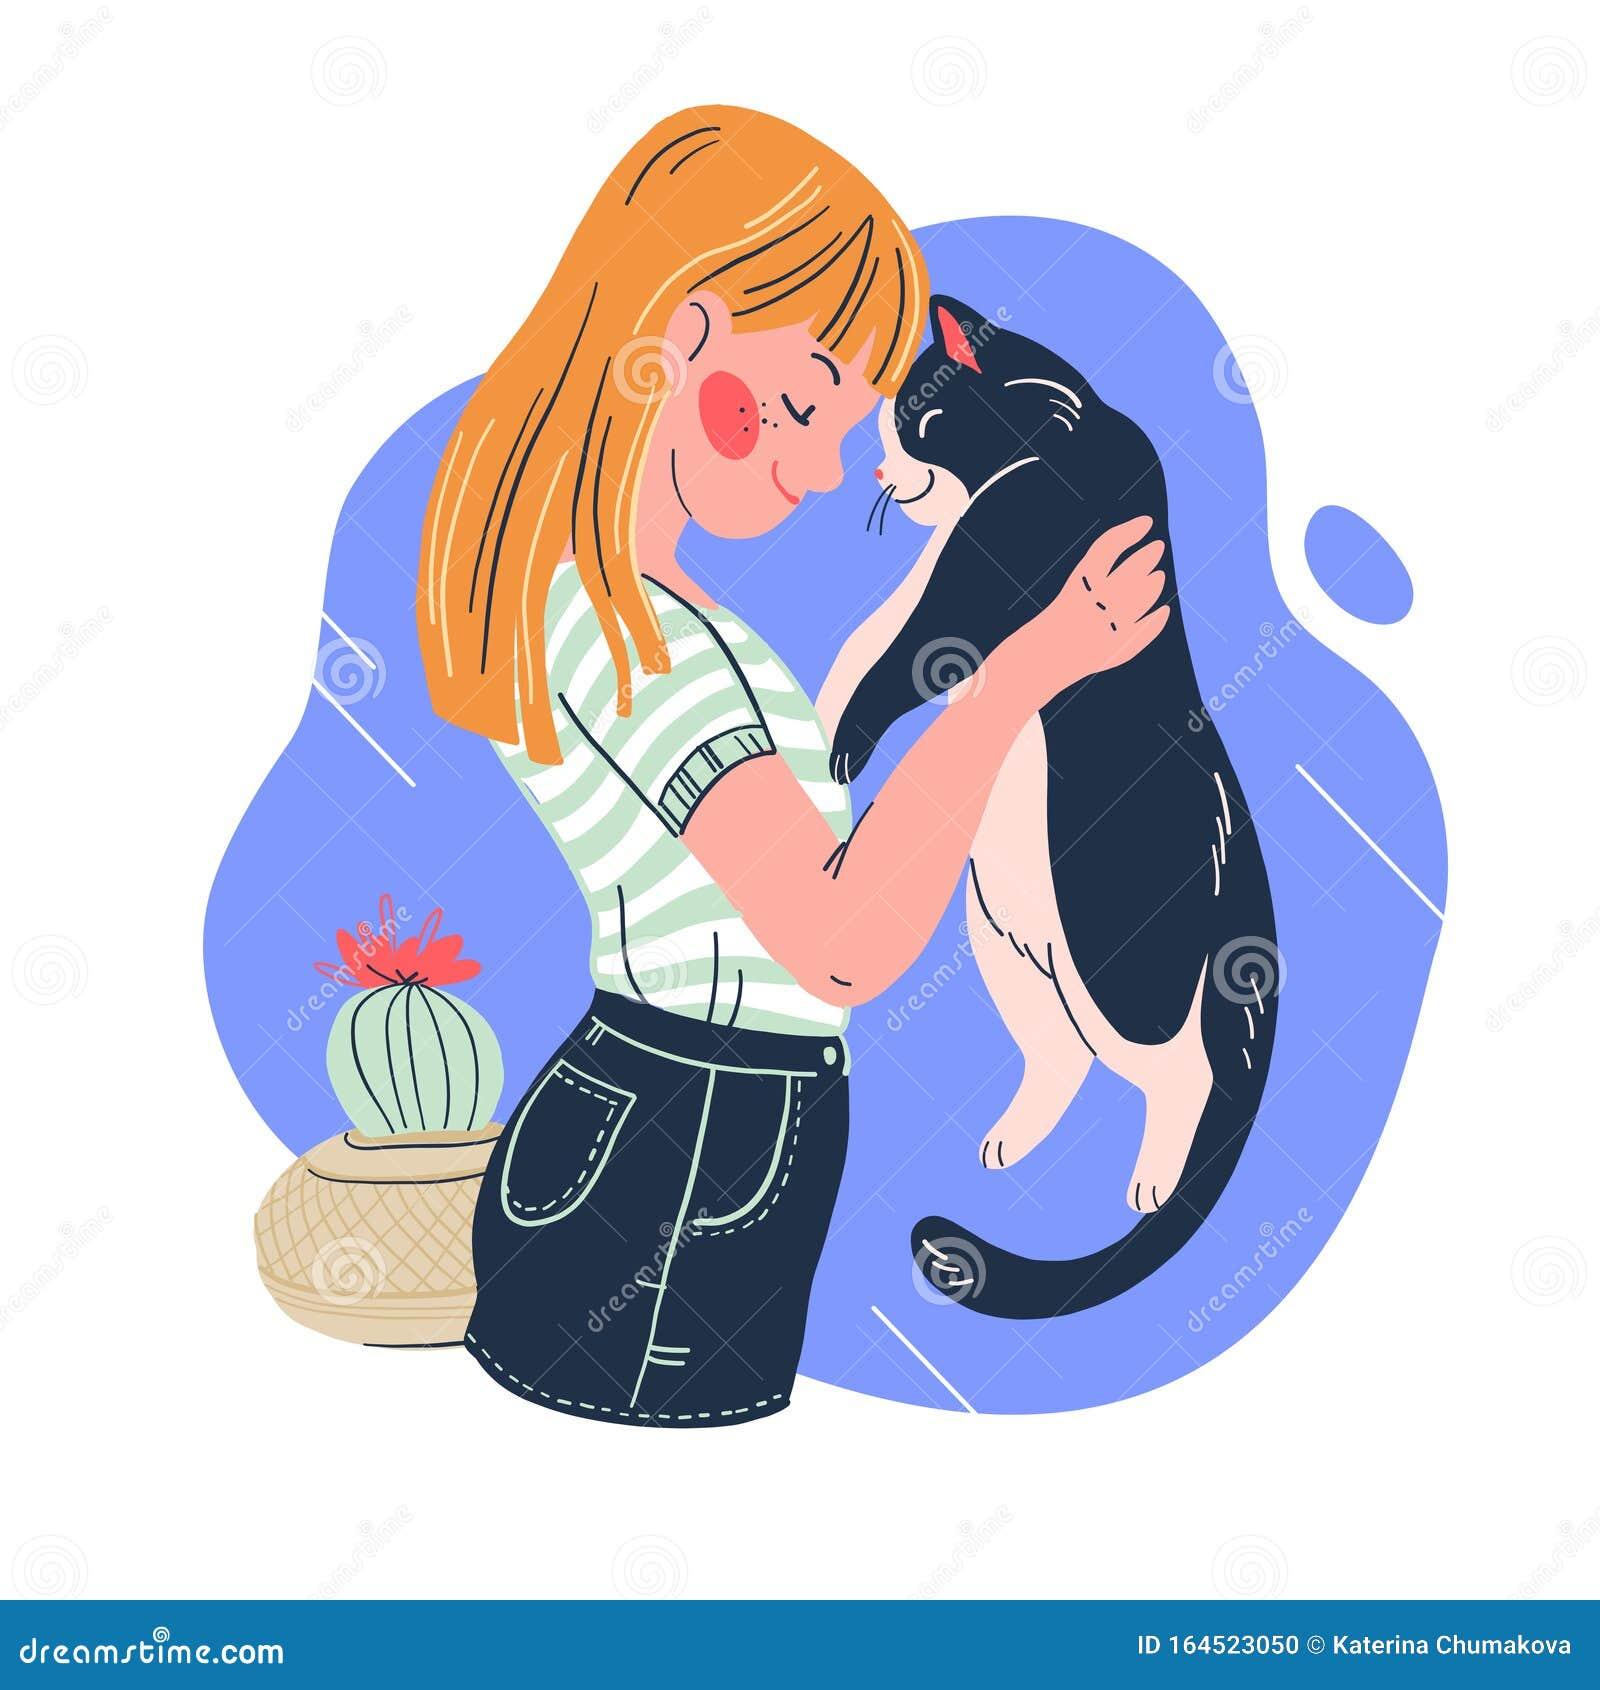 Cat Lover Stock Illustrations 1 900 Cat Lover Stock Illustrations Vectors Clipart Dreamstime